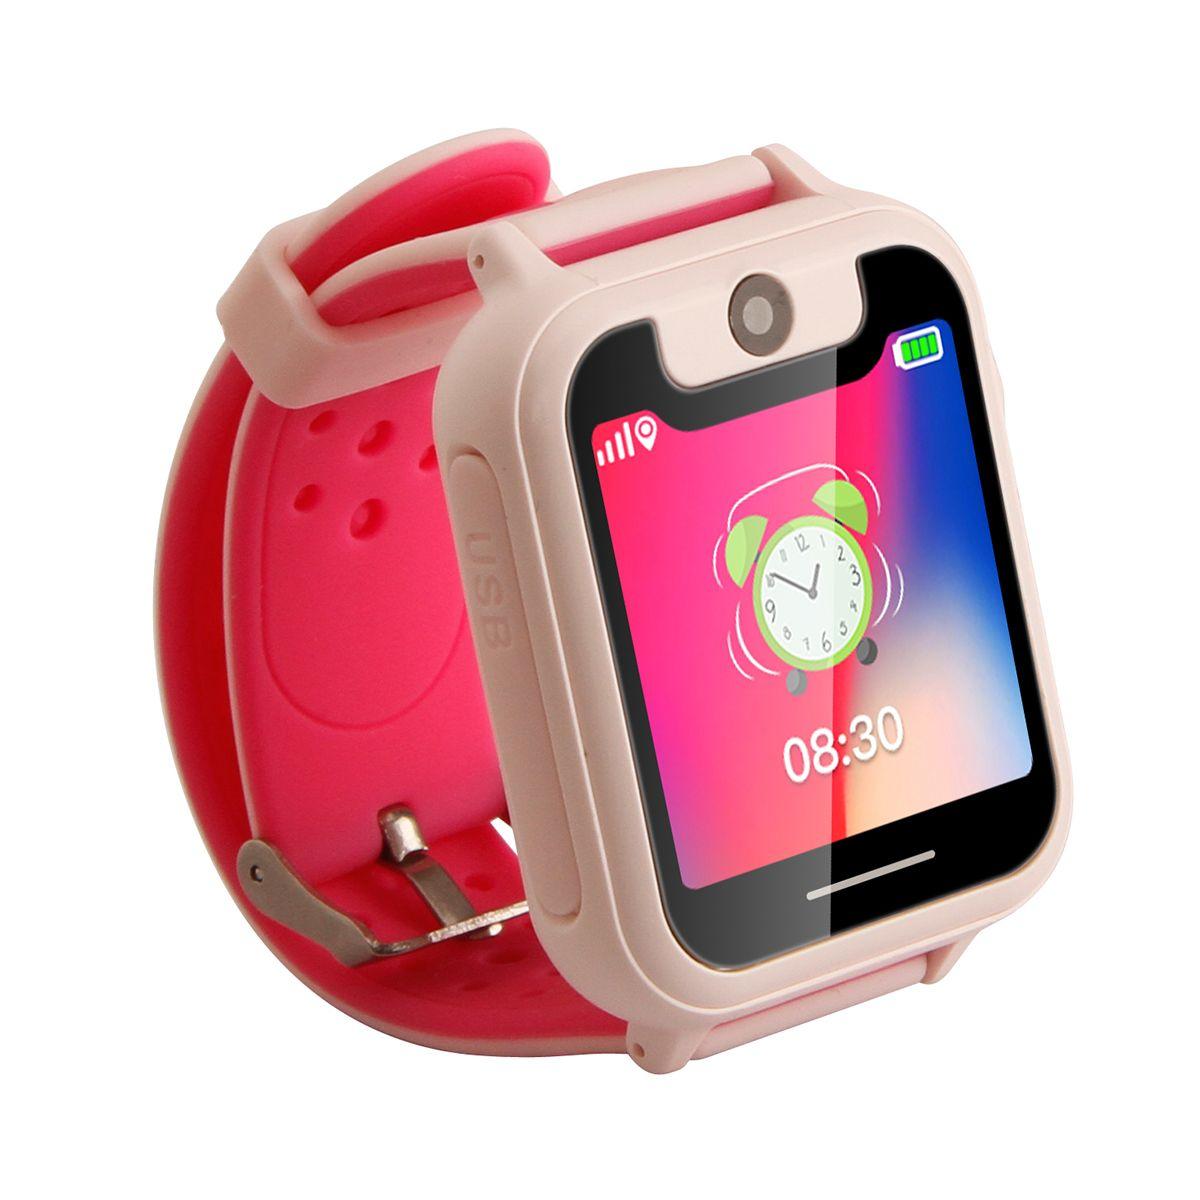 S6 Kids Watch S6 1.54 inch Touch Screen SOS GPRS Location Flashlight Camera Kids Game Children Smart Watch